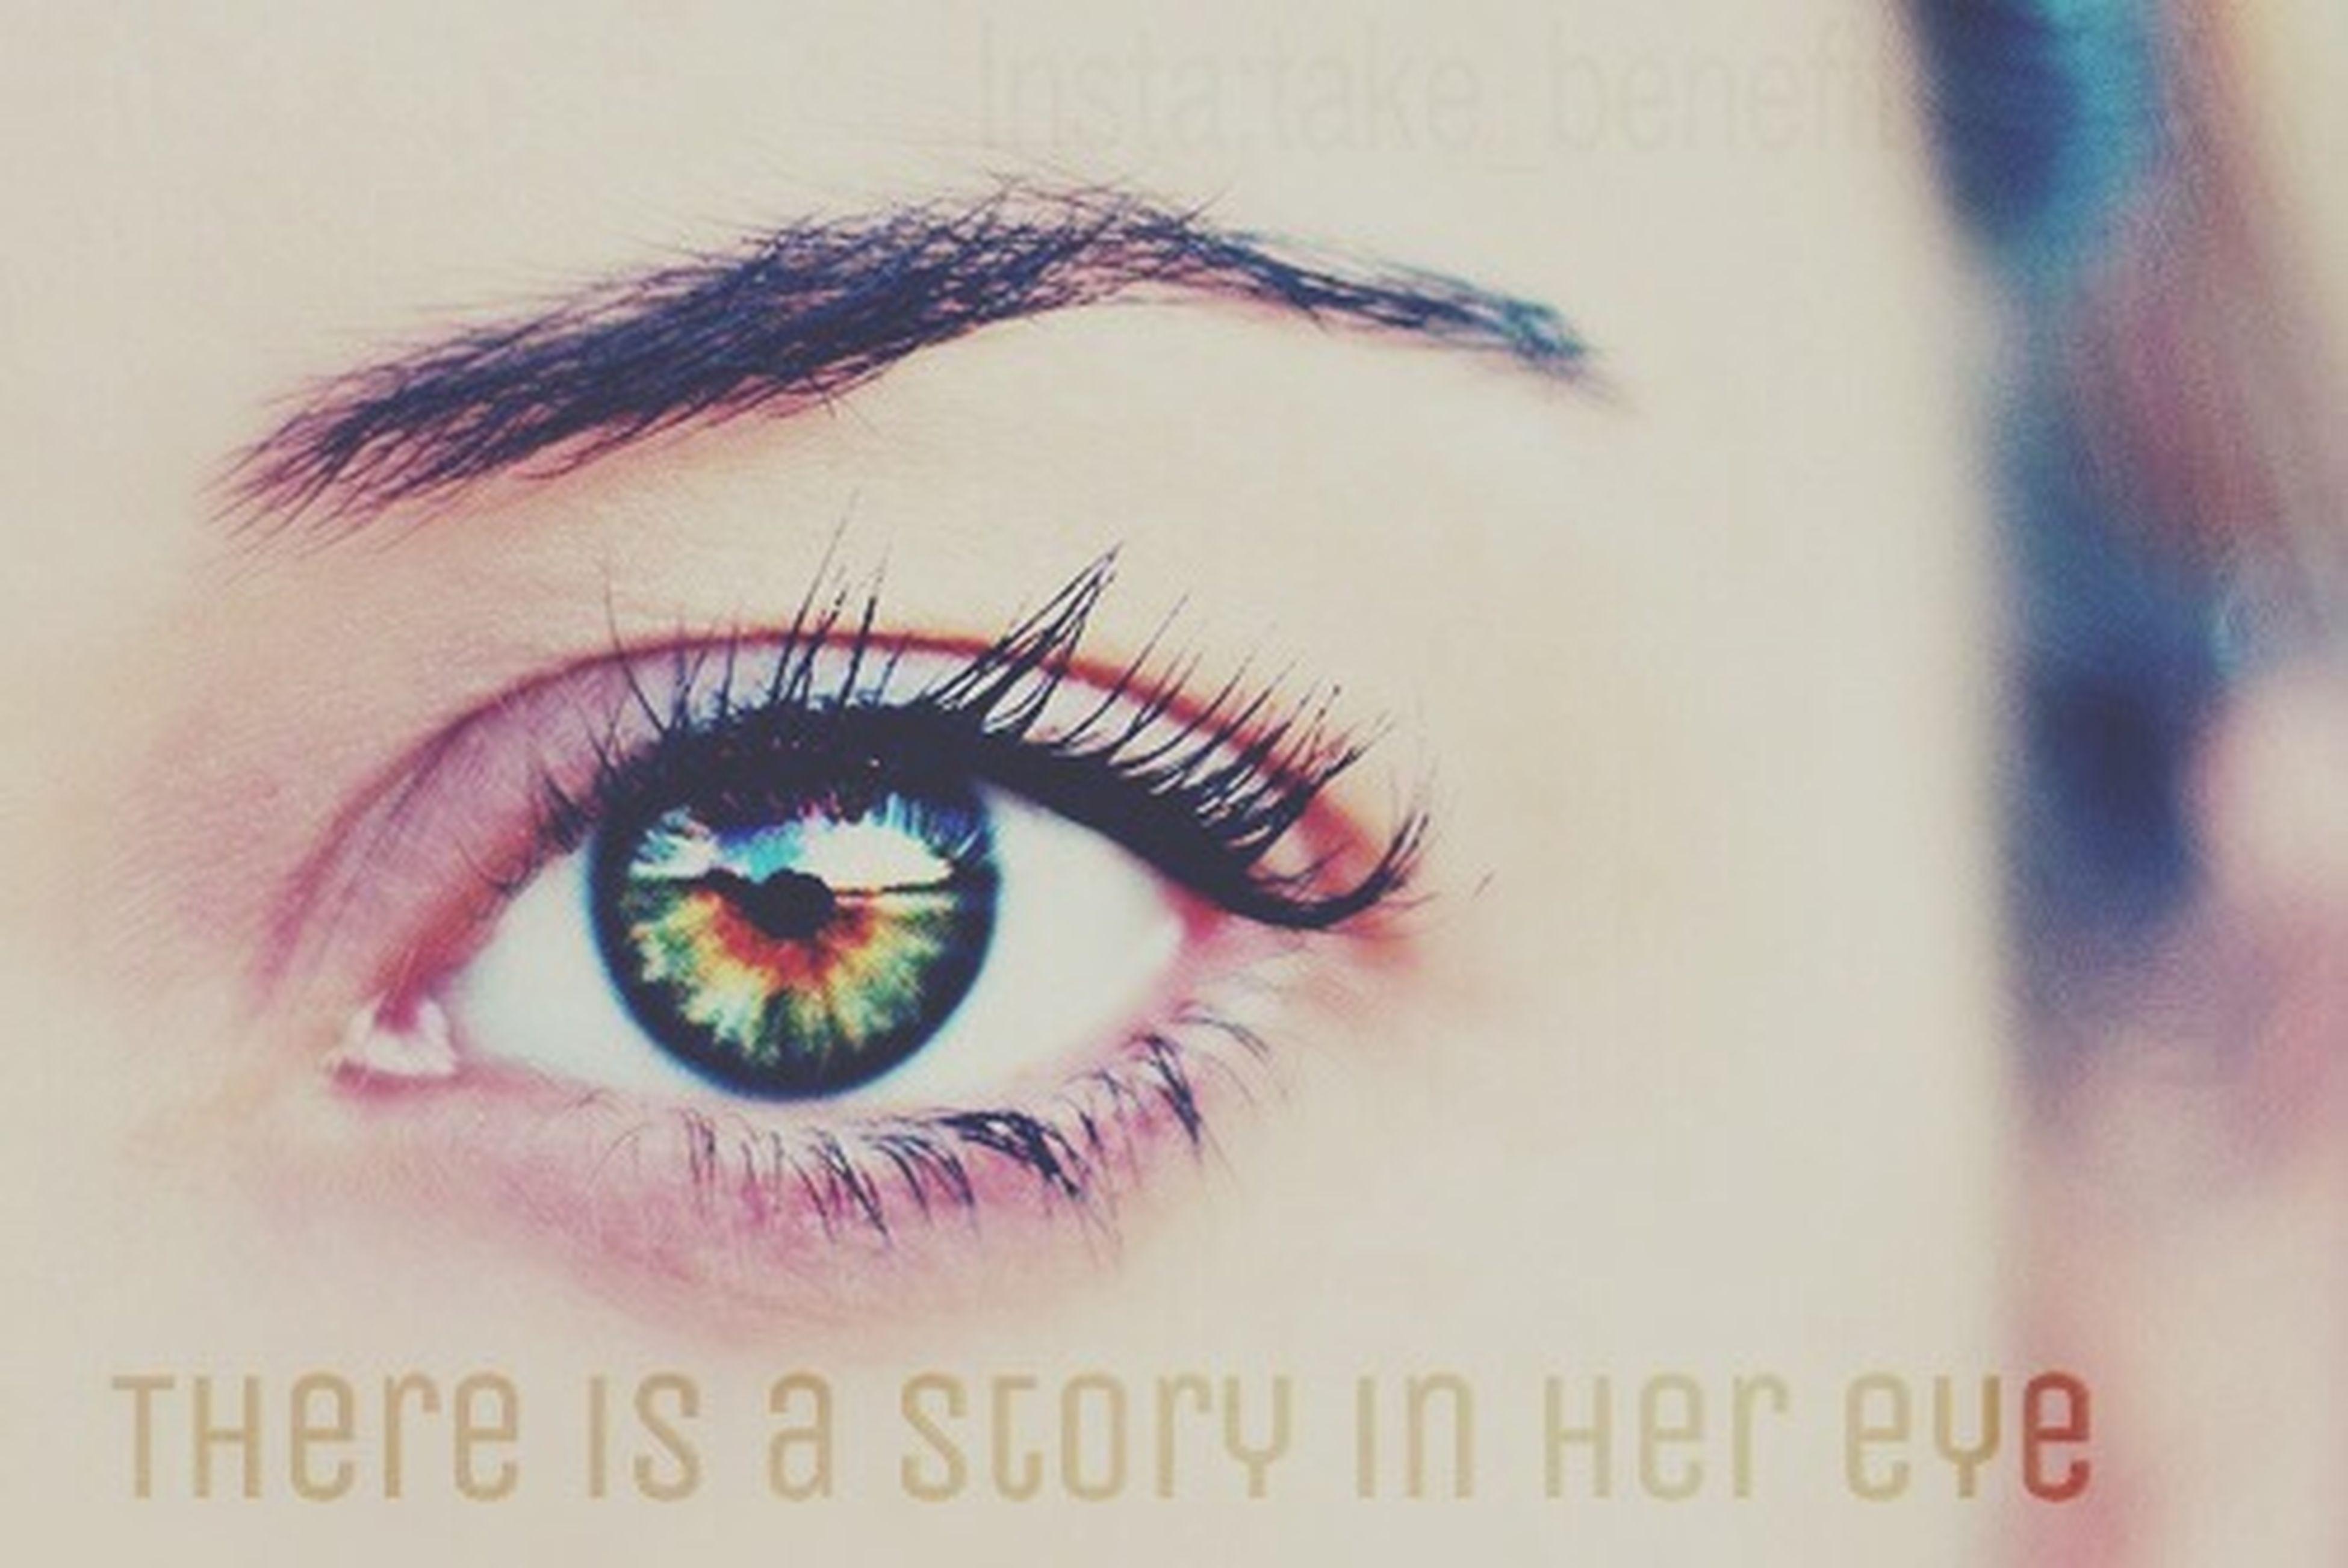 human eye, close-up, part of, eyelash, eyesight, indoors, lifestyles, person, studio shot, sensory perception, white background, eyeball, human skin, leisure activity, looking at camera, unrecognizable person